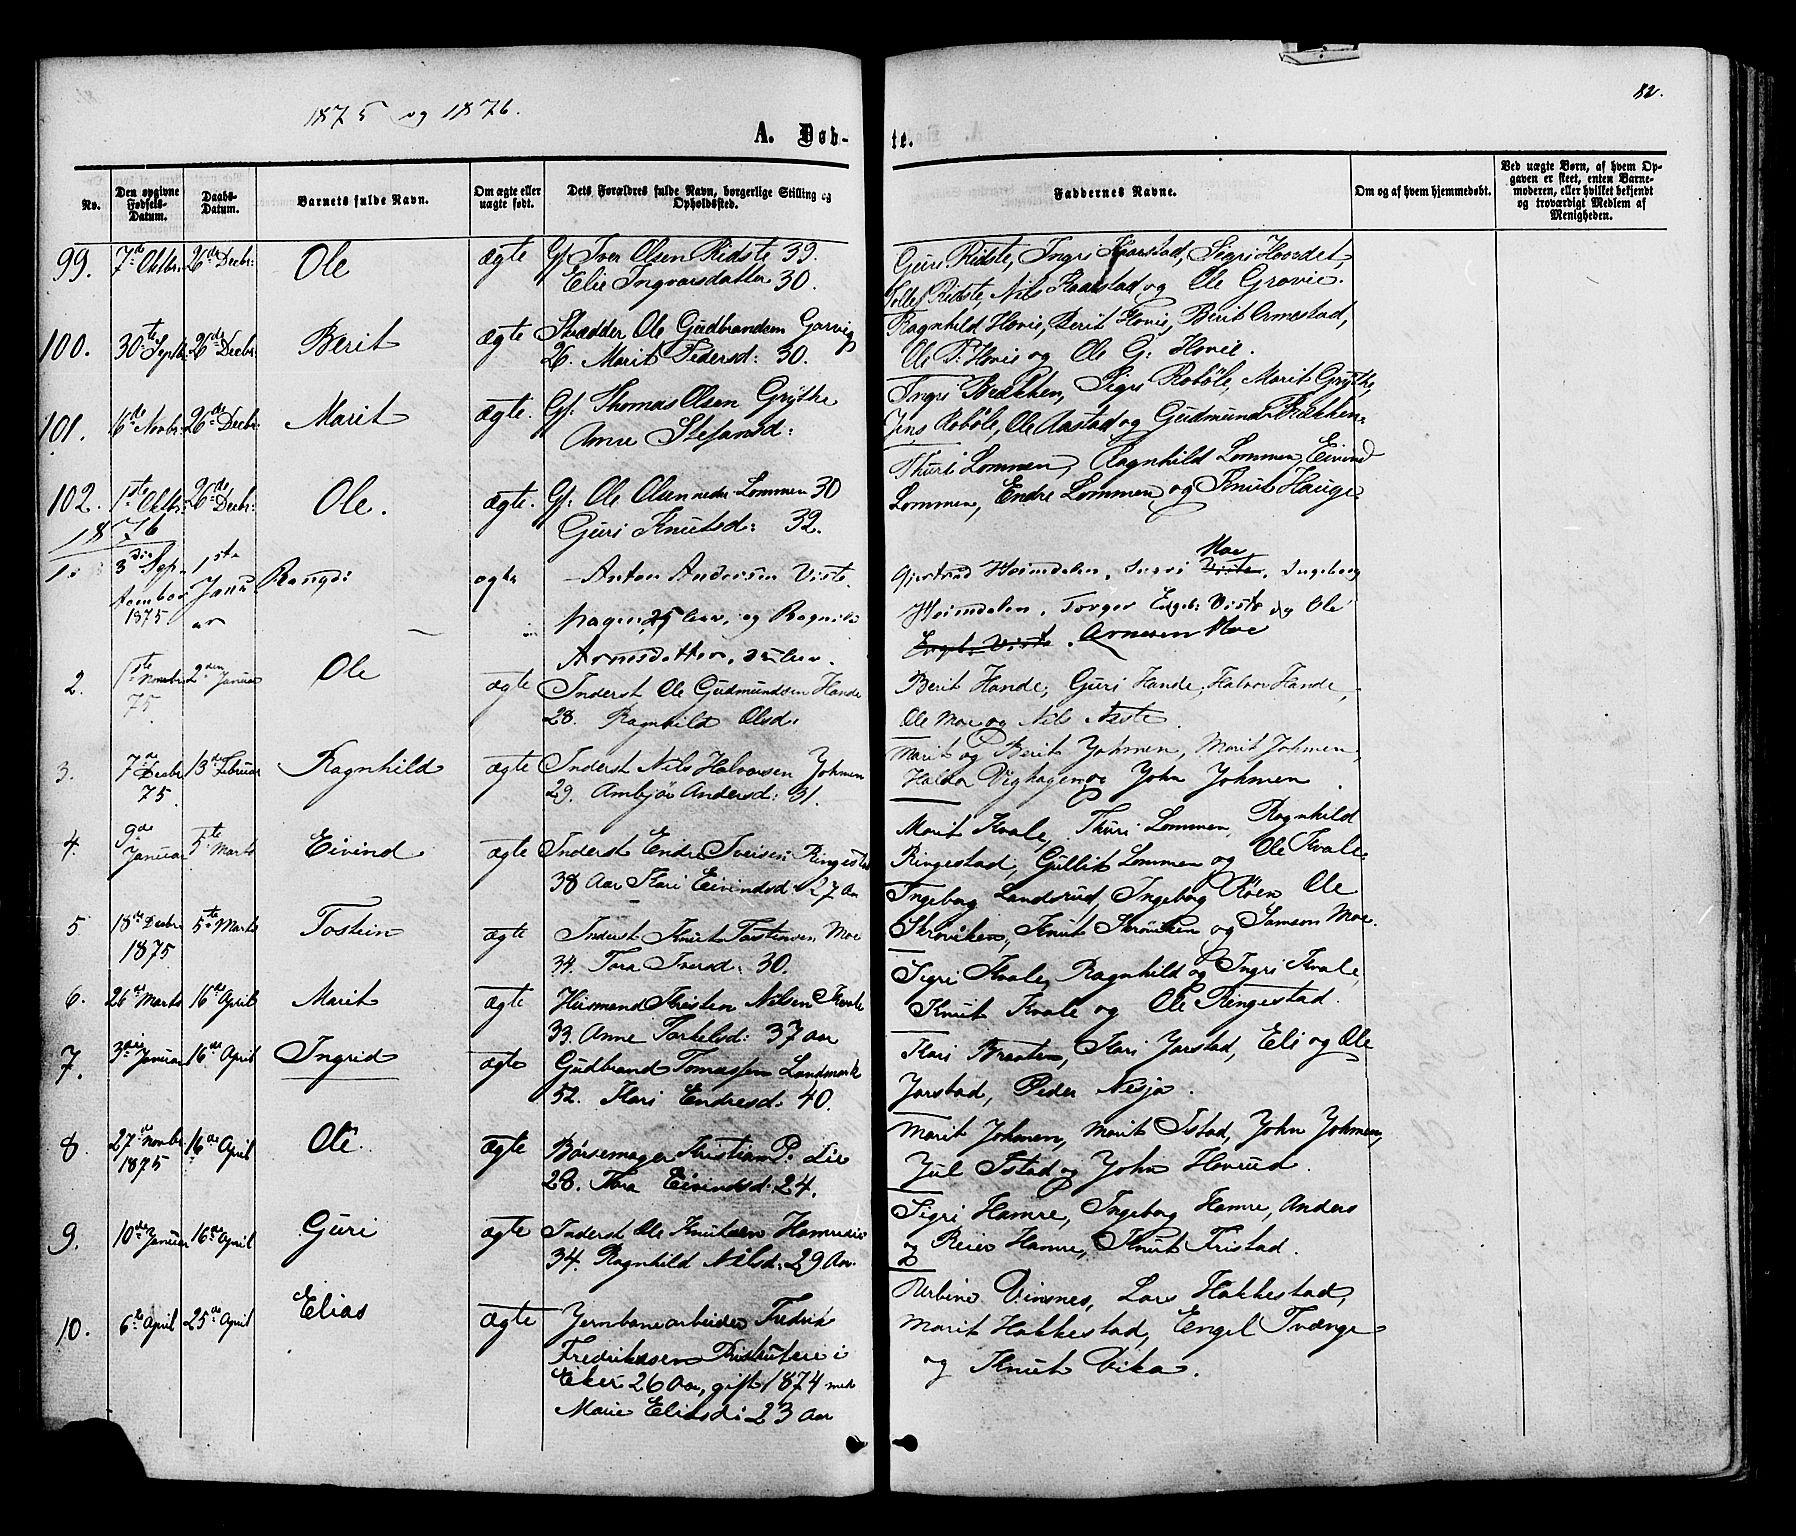 SAH, Vestre Slidre prestekontor, Ministerialbok nr. 3, 1865-1880, s. 82